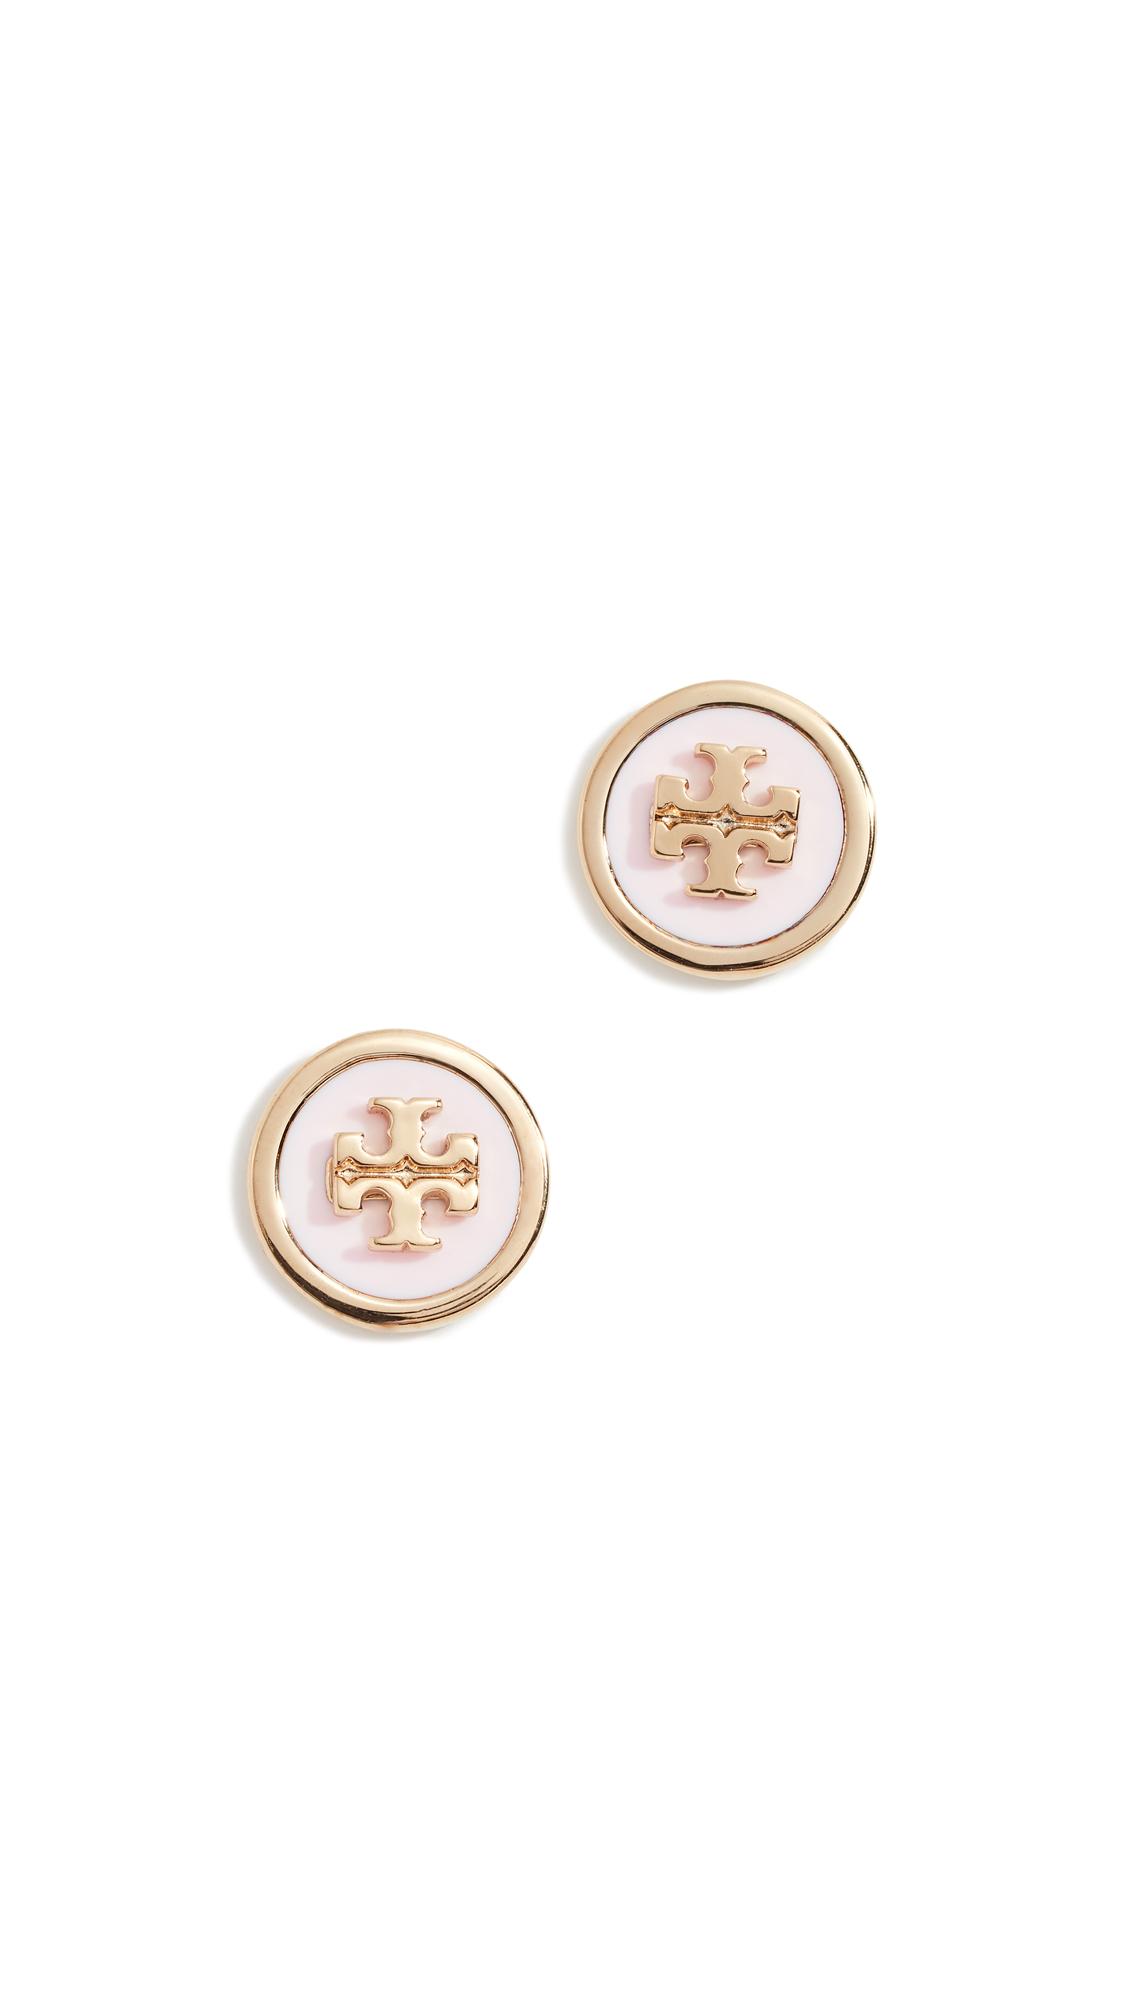 Enamel Raised Logo Stud Earrings in Pink/Gold